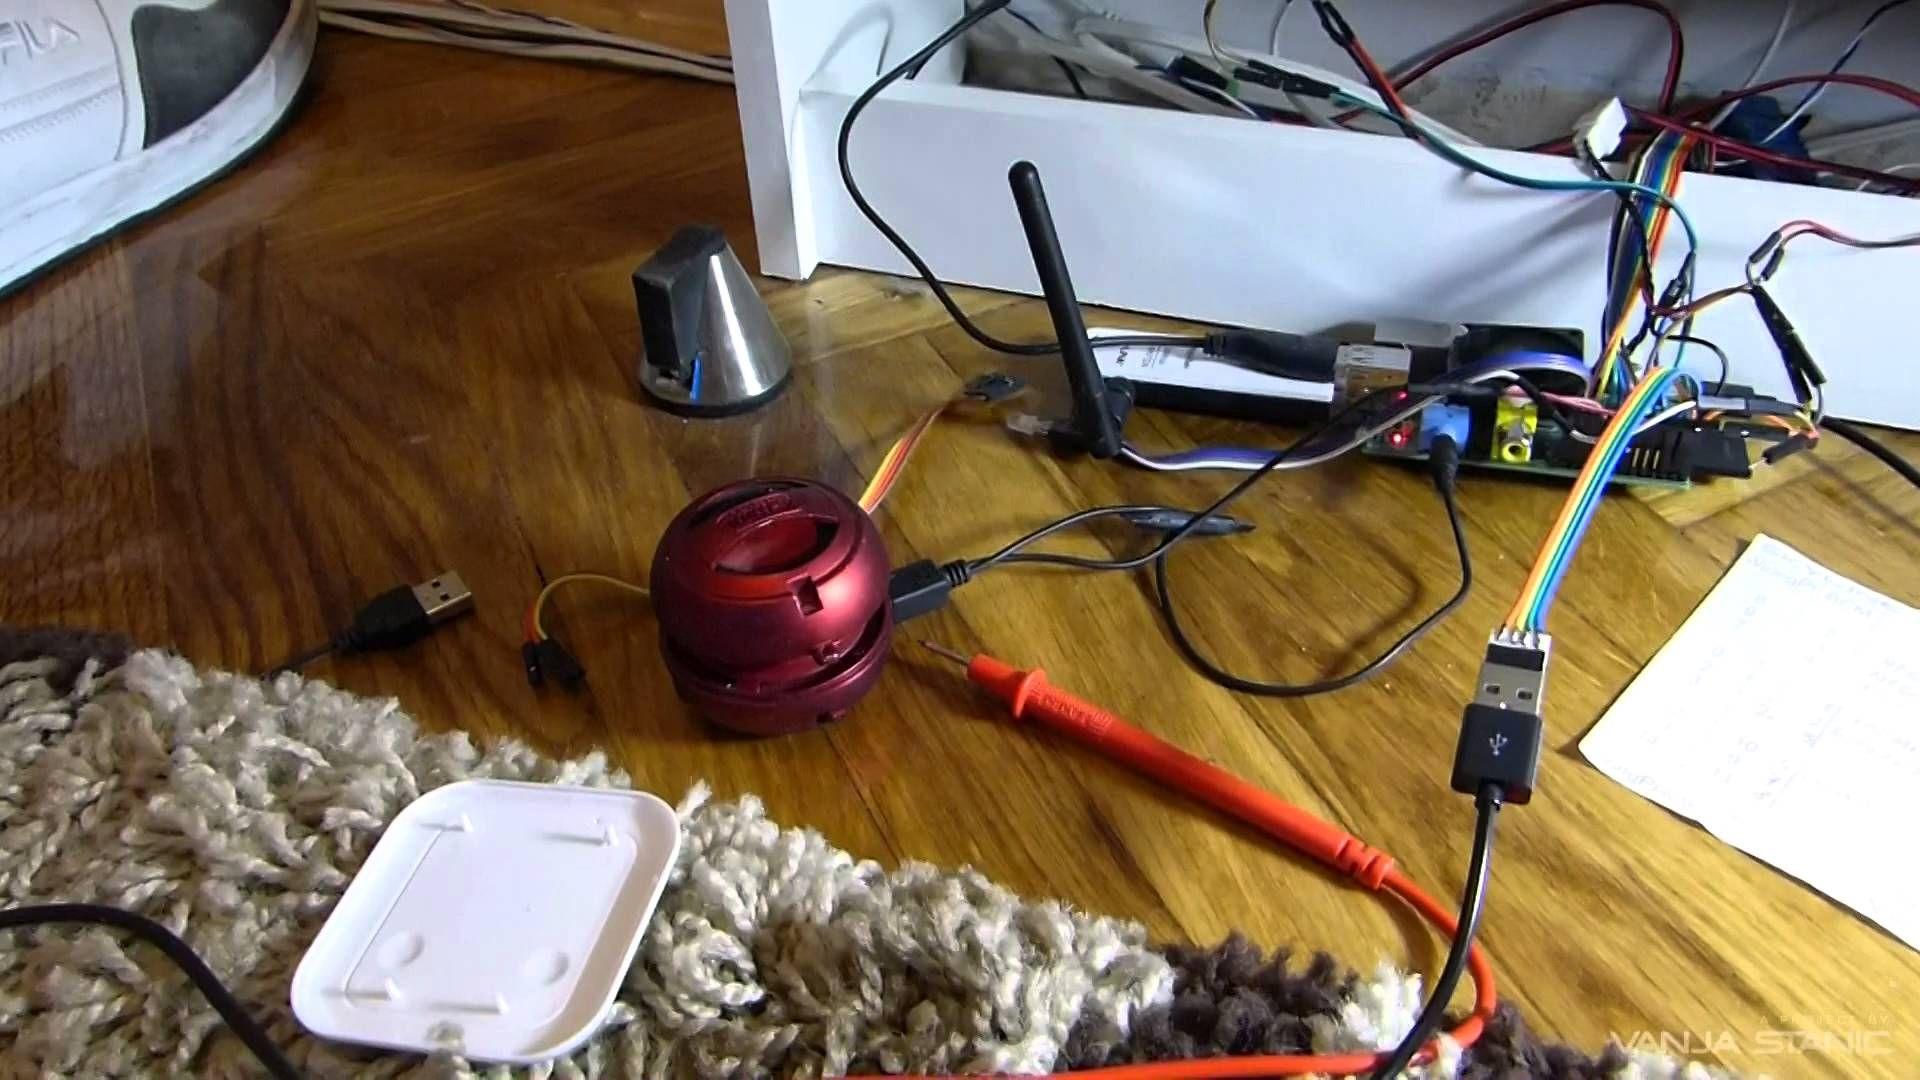 Advanced Home Control System - A Raspberry Pi Project | Raspberry Pi ...